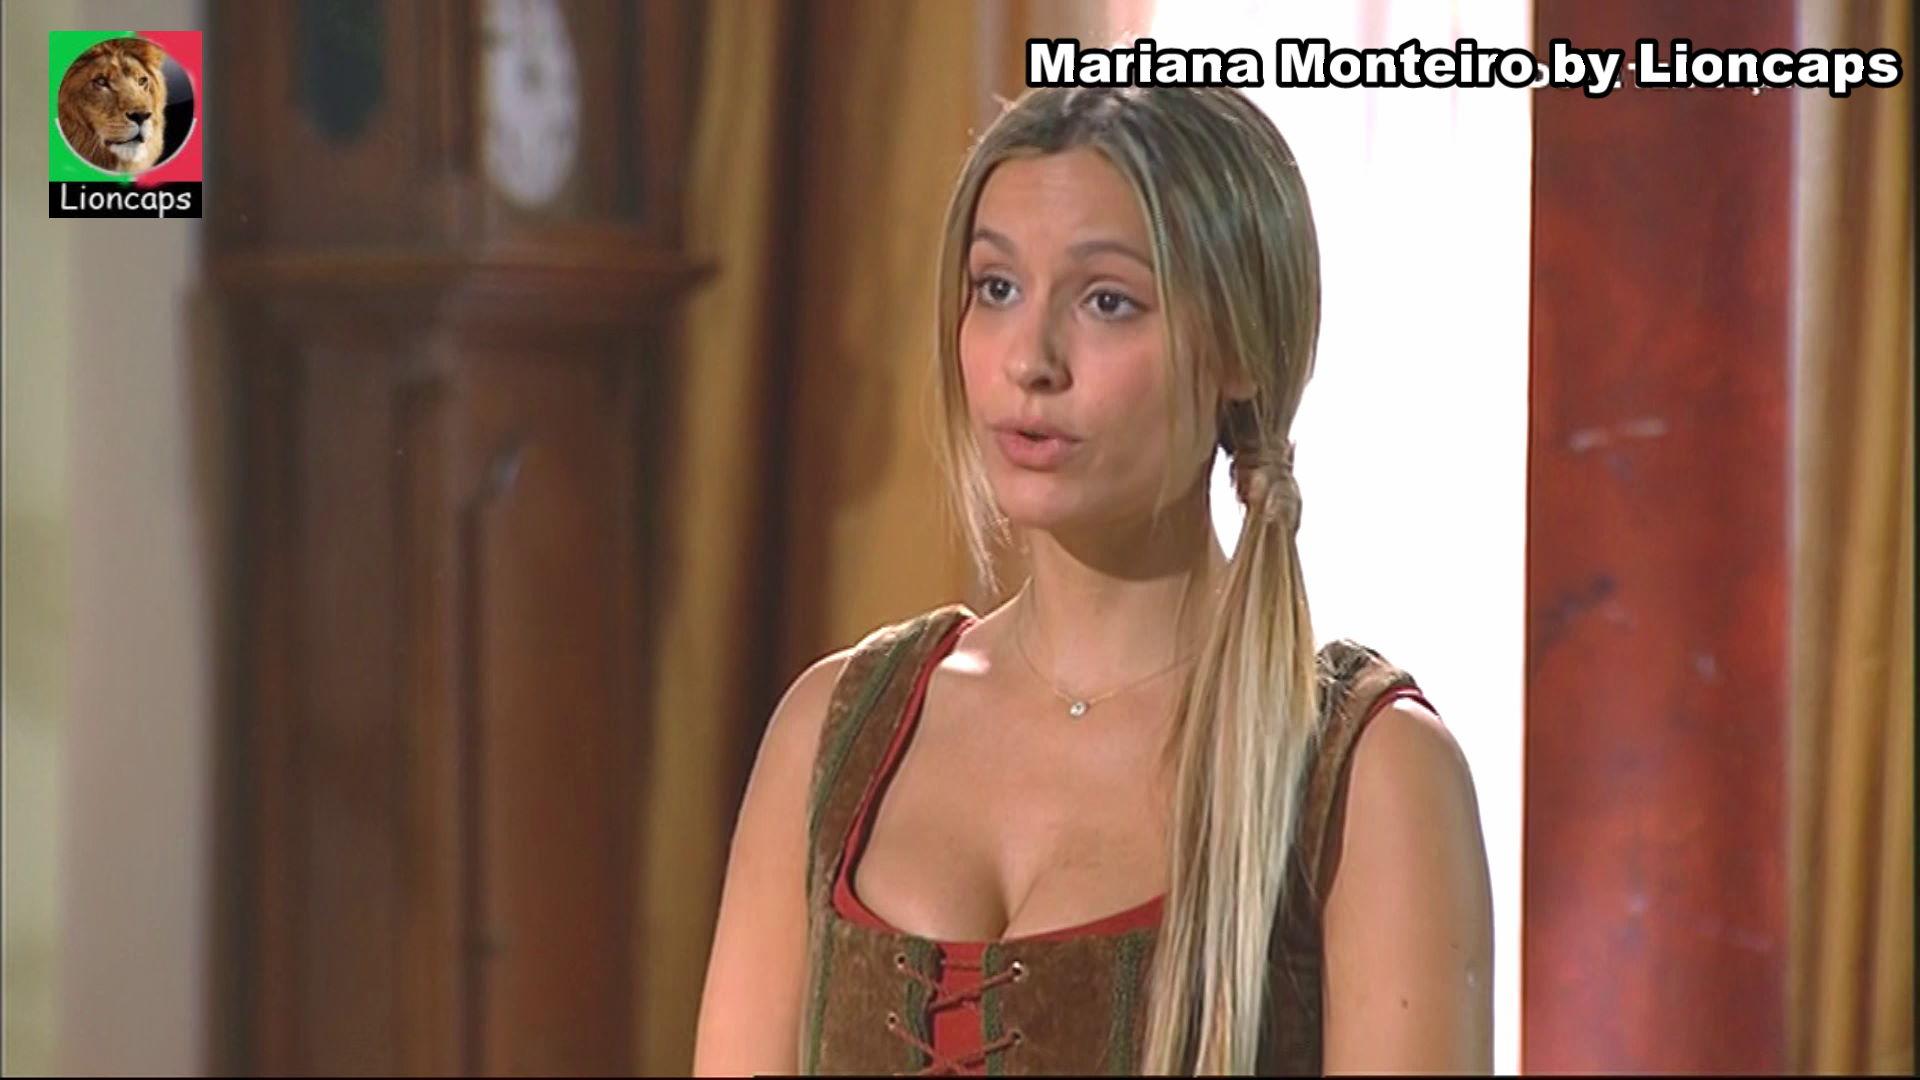 738369701_mariana_monteiro_vs190209_1922_122_361lo.JPG